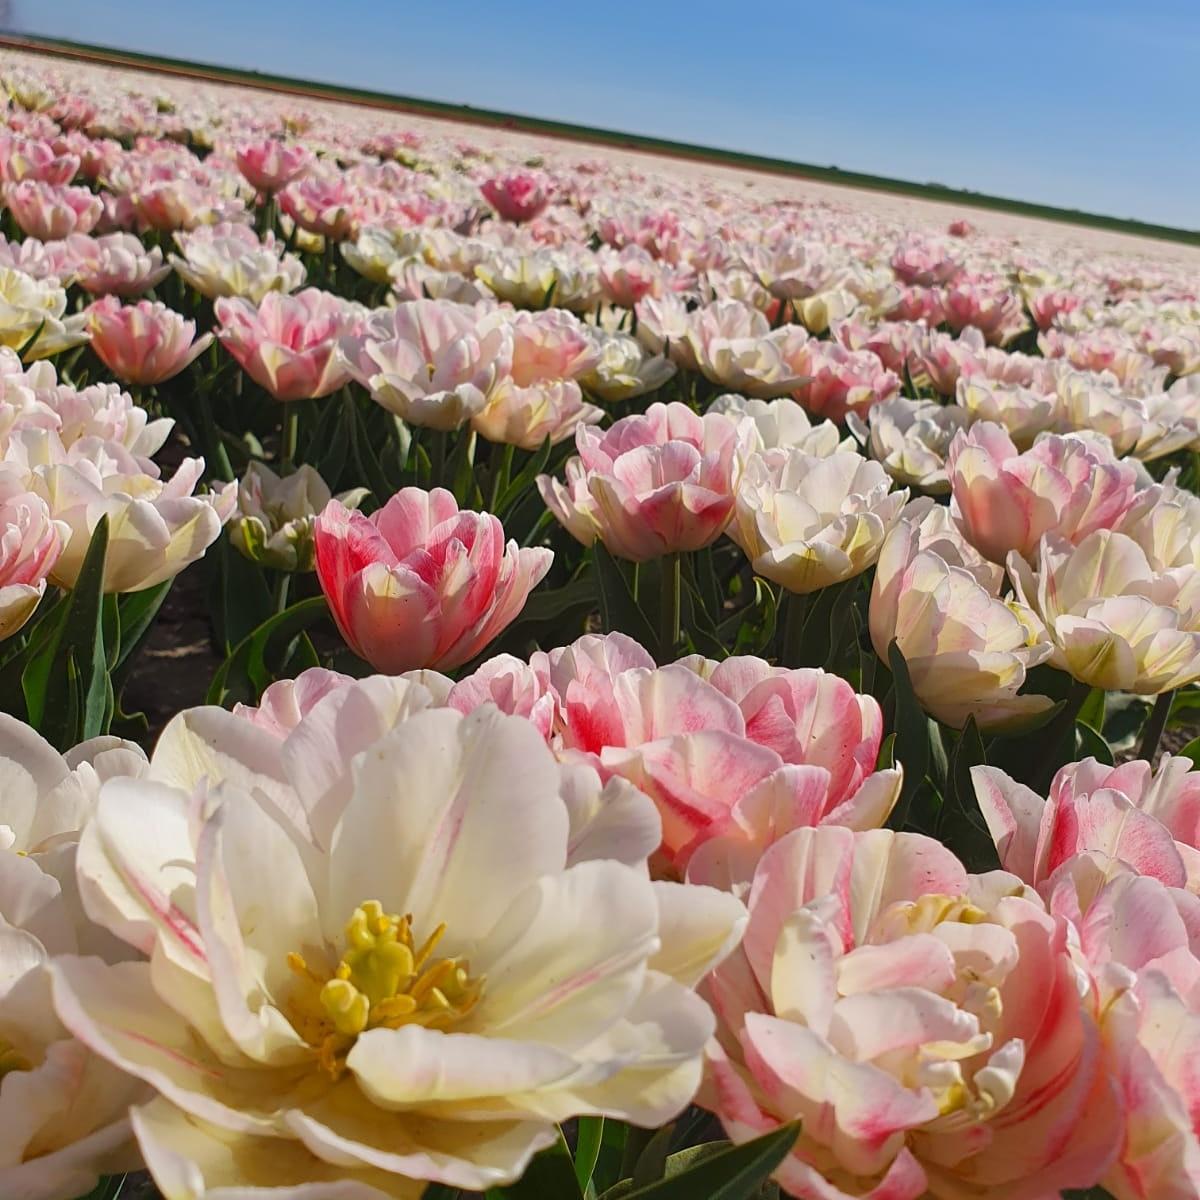 #Tulips  #Almere photo Michael Sluiterpic.twitter.com/DPcvAxx4hI